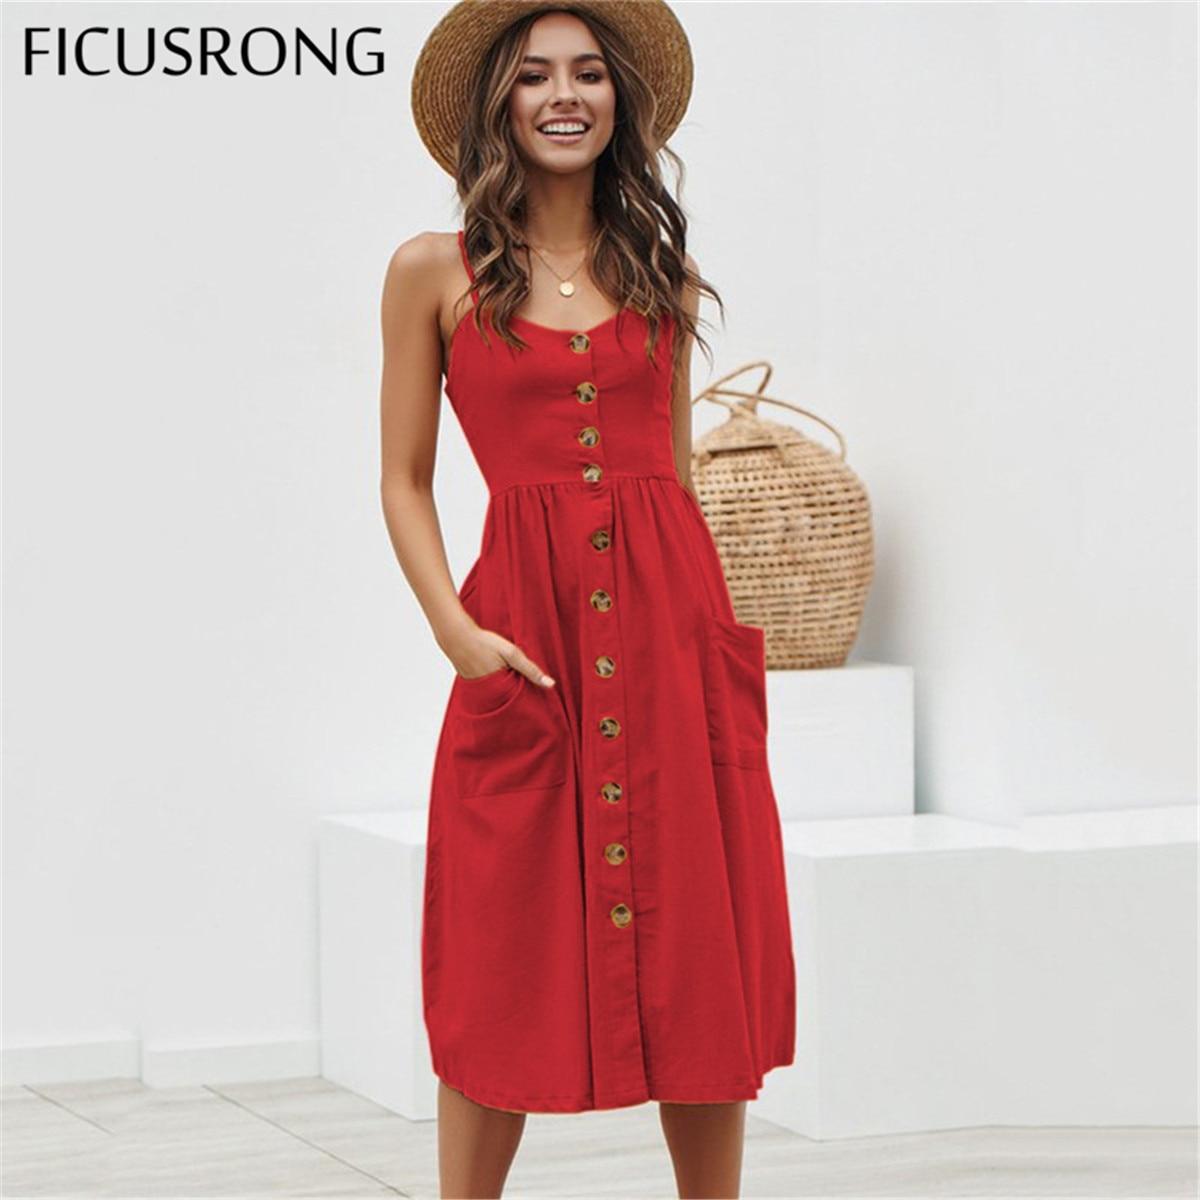 Elegant Button Women Dress Polka Dots Red Cotton Midi Dress 2020 Summer Casual Female Plus Size Lady Beach Vestidos FICUSRONG